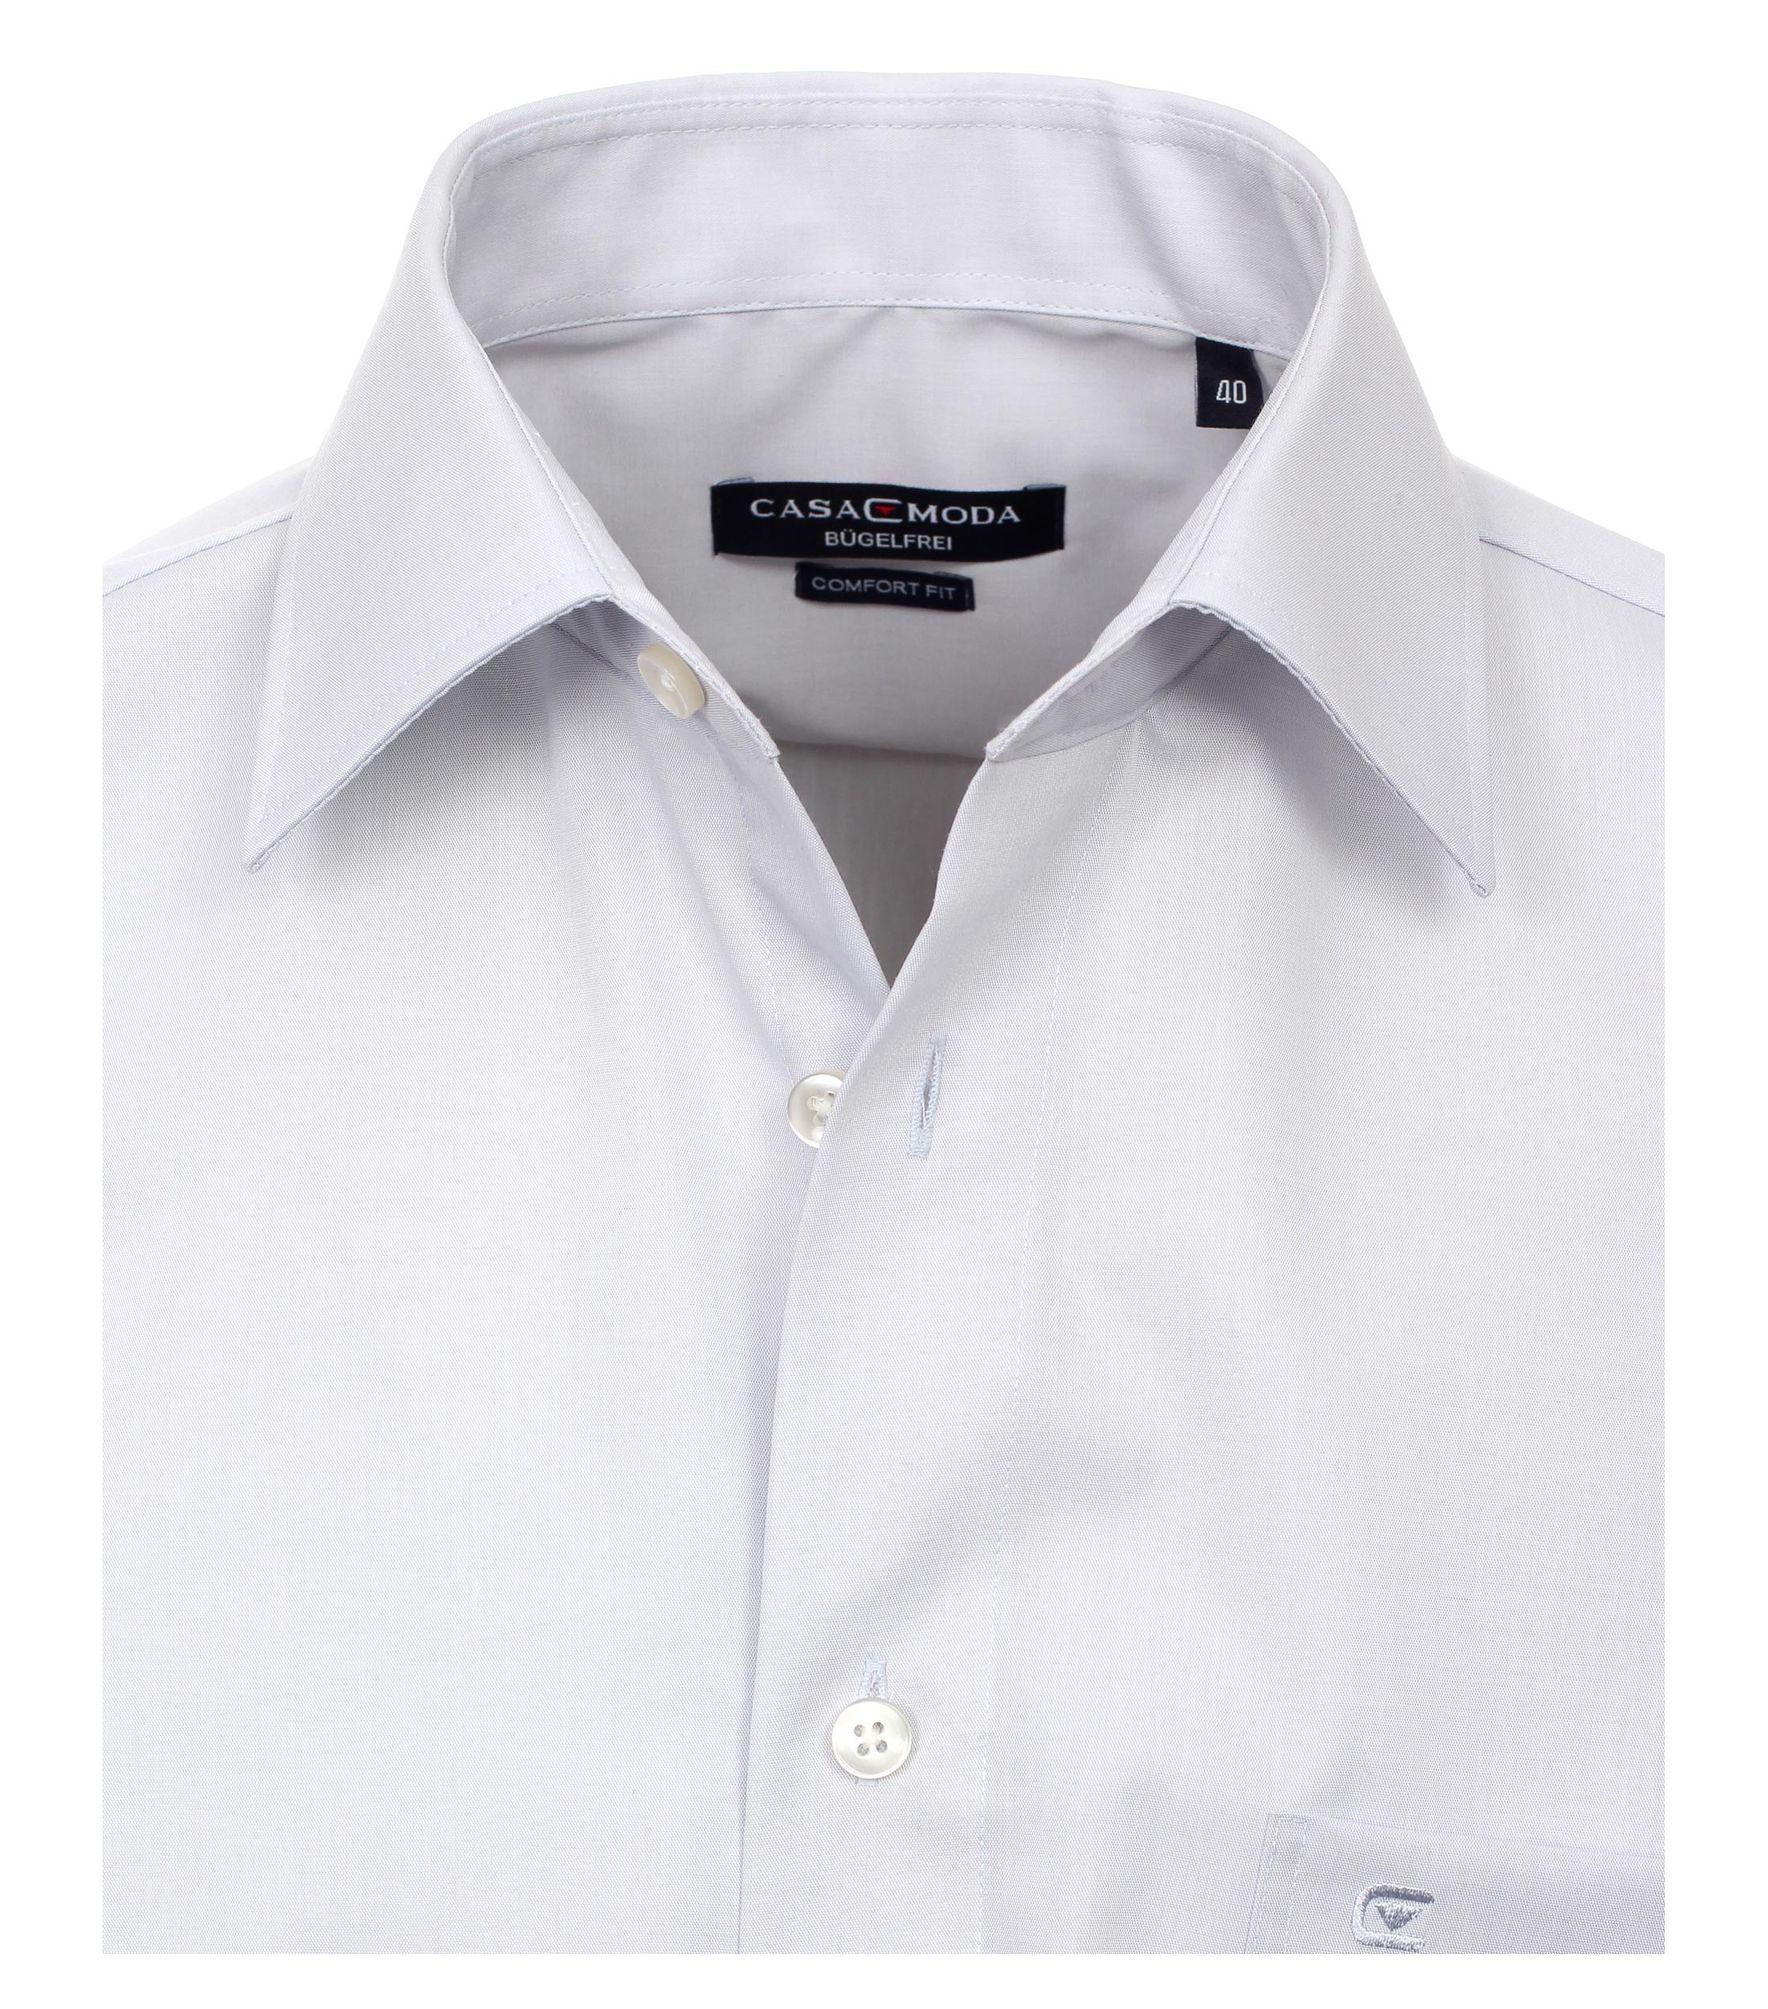 online store 7a6c4 d5037 Casa Moda - Comfort Fit - Bügelfreies Herren Business Hemd mit Extra kurzem  Arm (58cm) in verschiedenen Farben (006068)